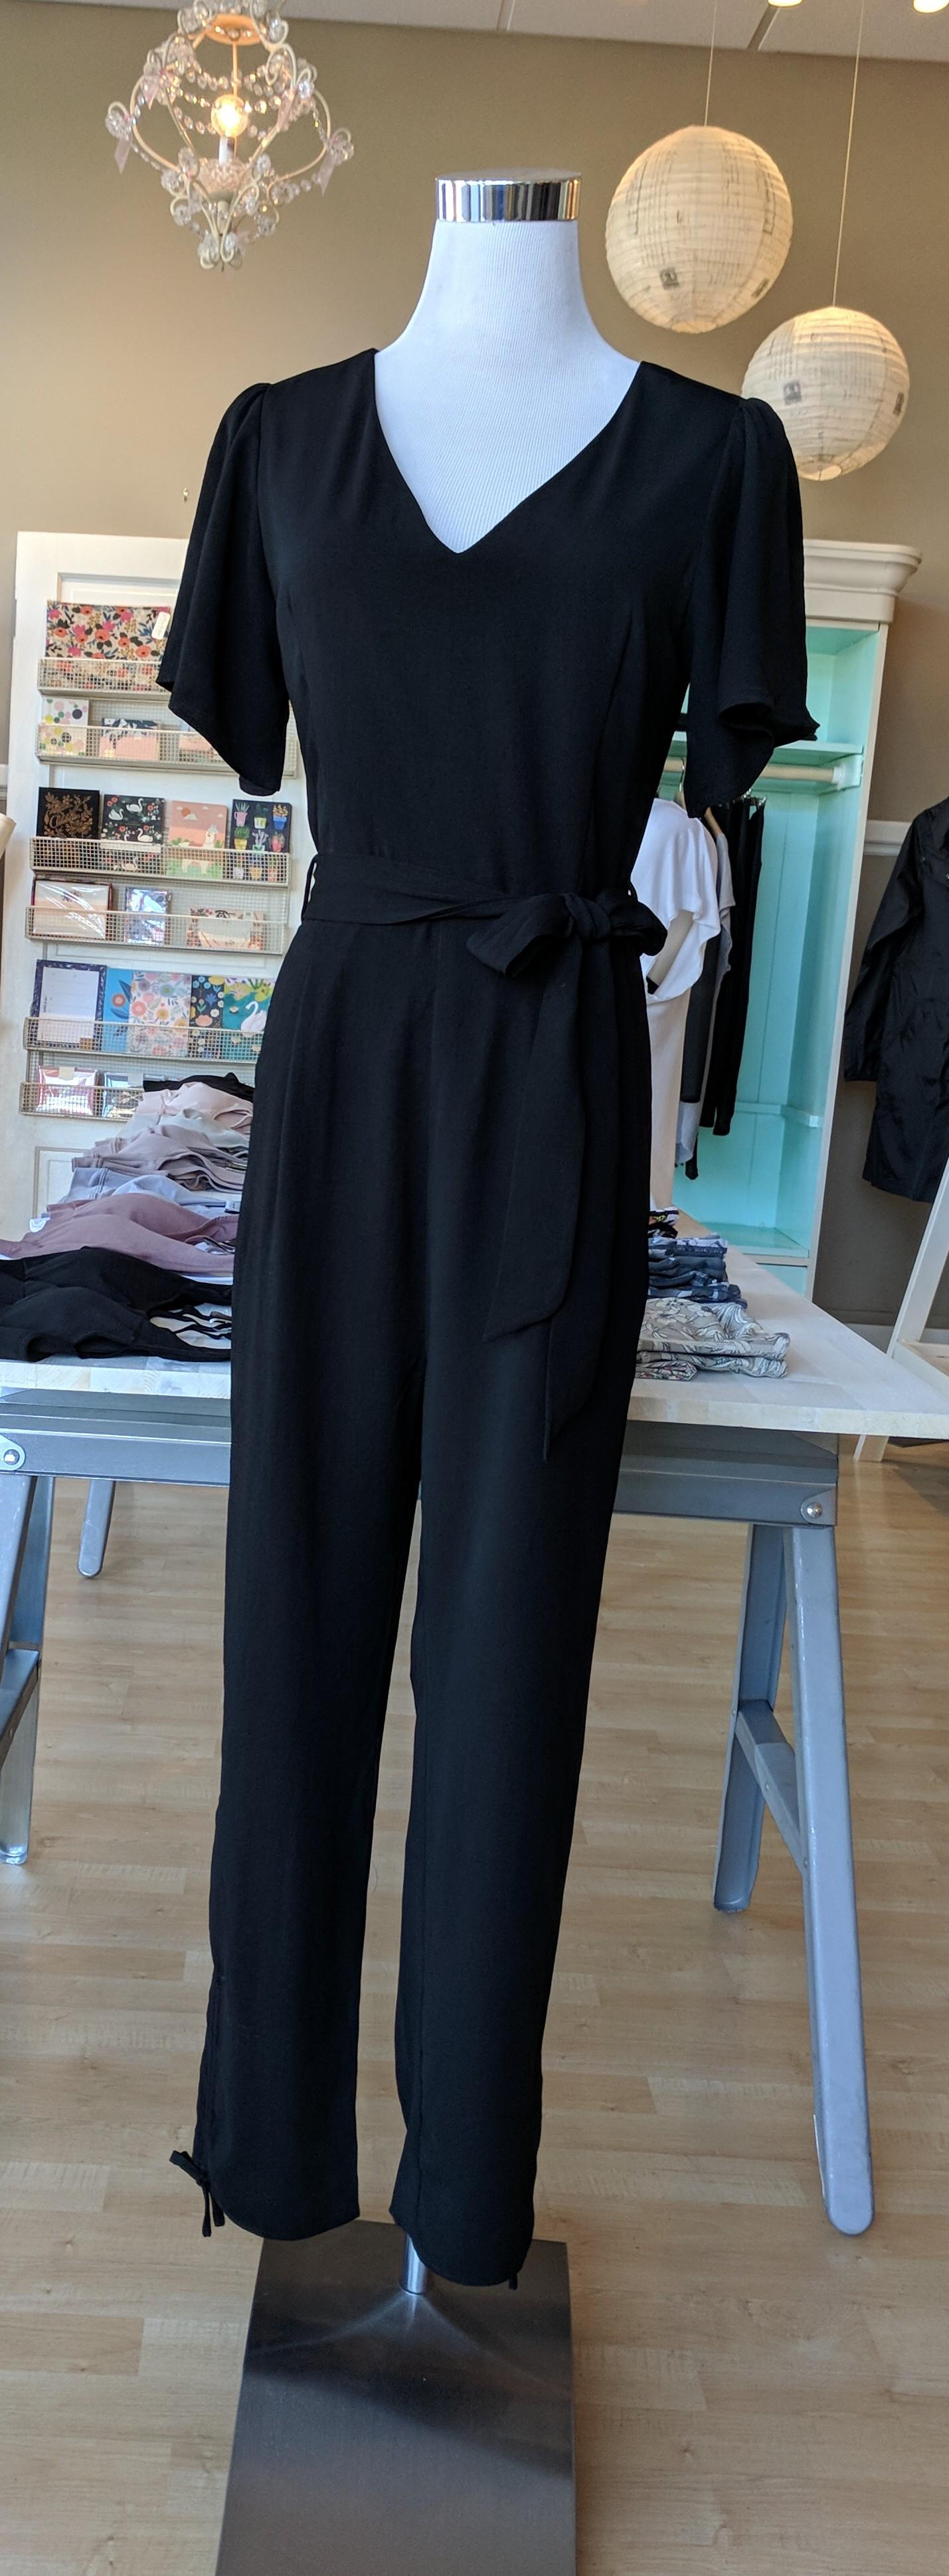 Black v-neck jumpsuit with tie $62